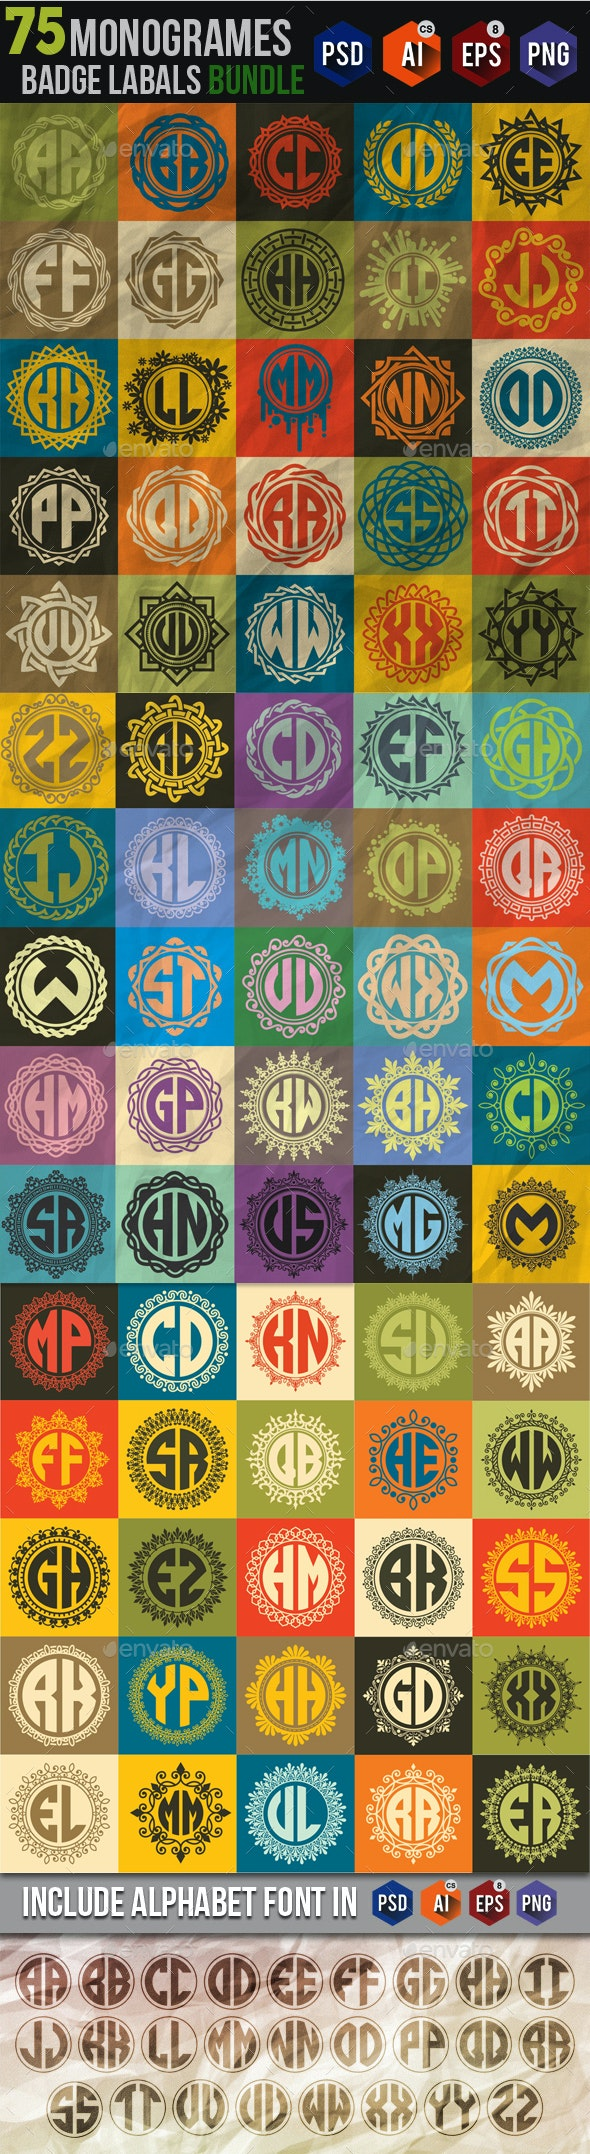 75 Monogrames Badge Labals With Alphabet Bundel - Badges & Stickers Web Elements